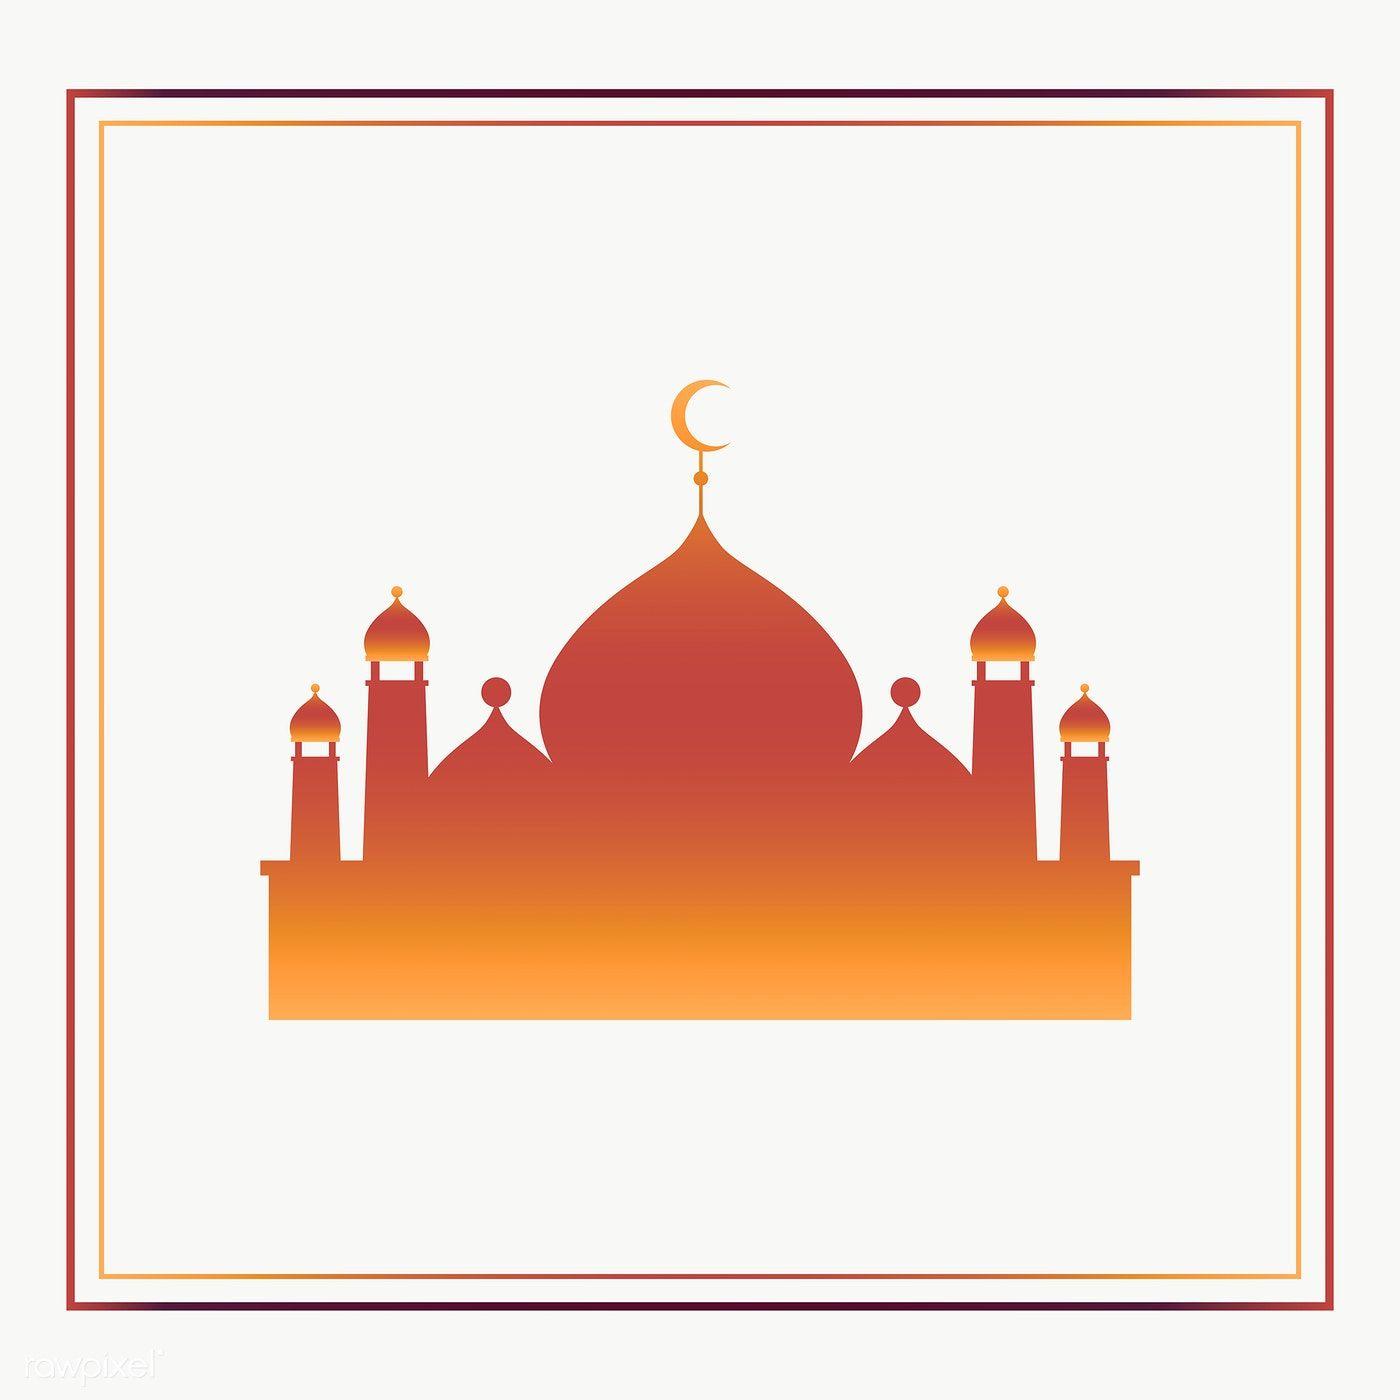 Eid Mubarak Design Element Transparent Png Free Image By Rawpixel Com Juju Eid Mubarak Arabesque Design Design Element